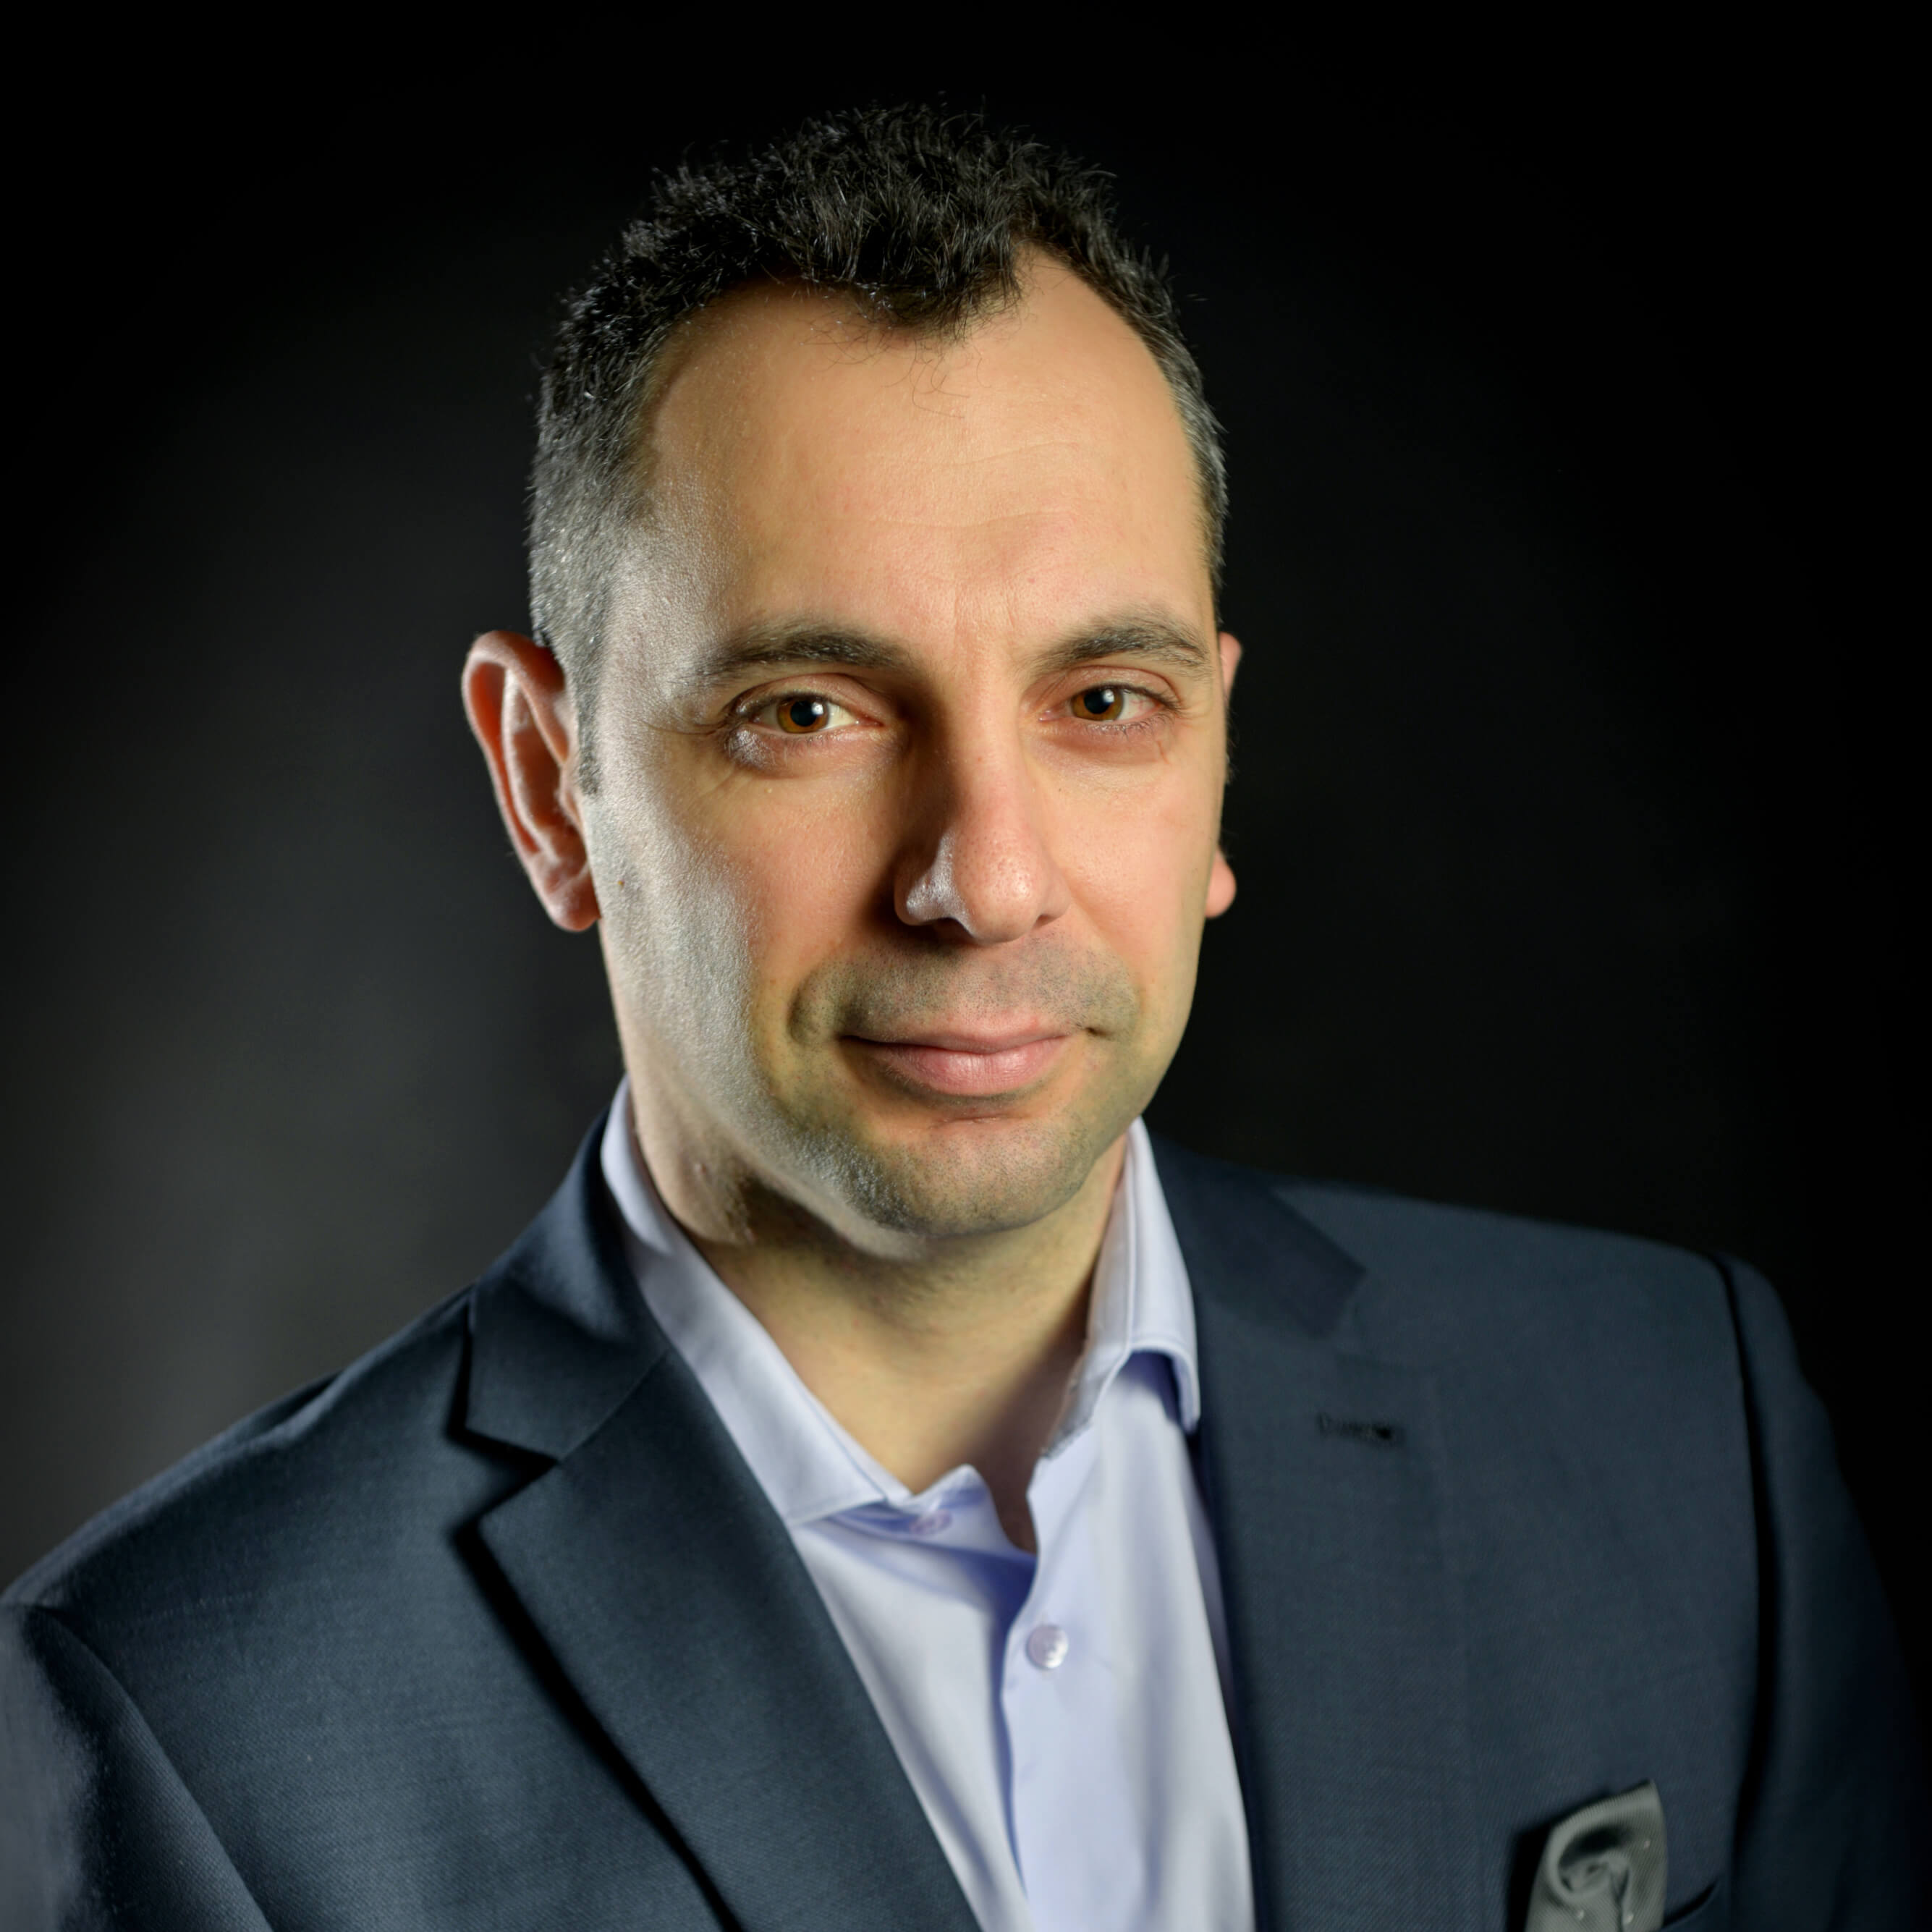 Christos Matskas